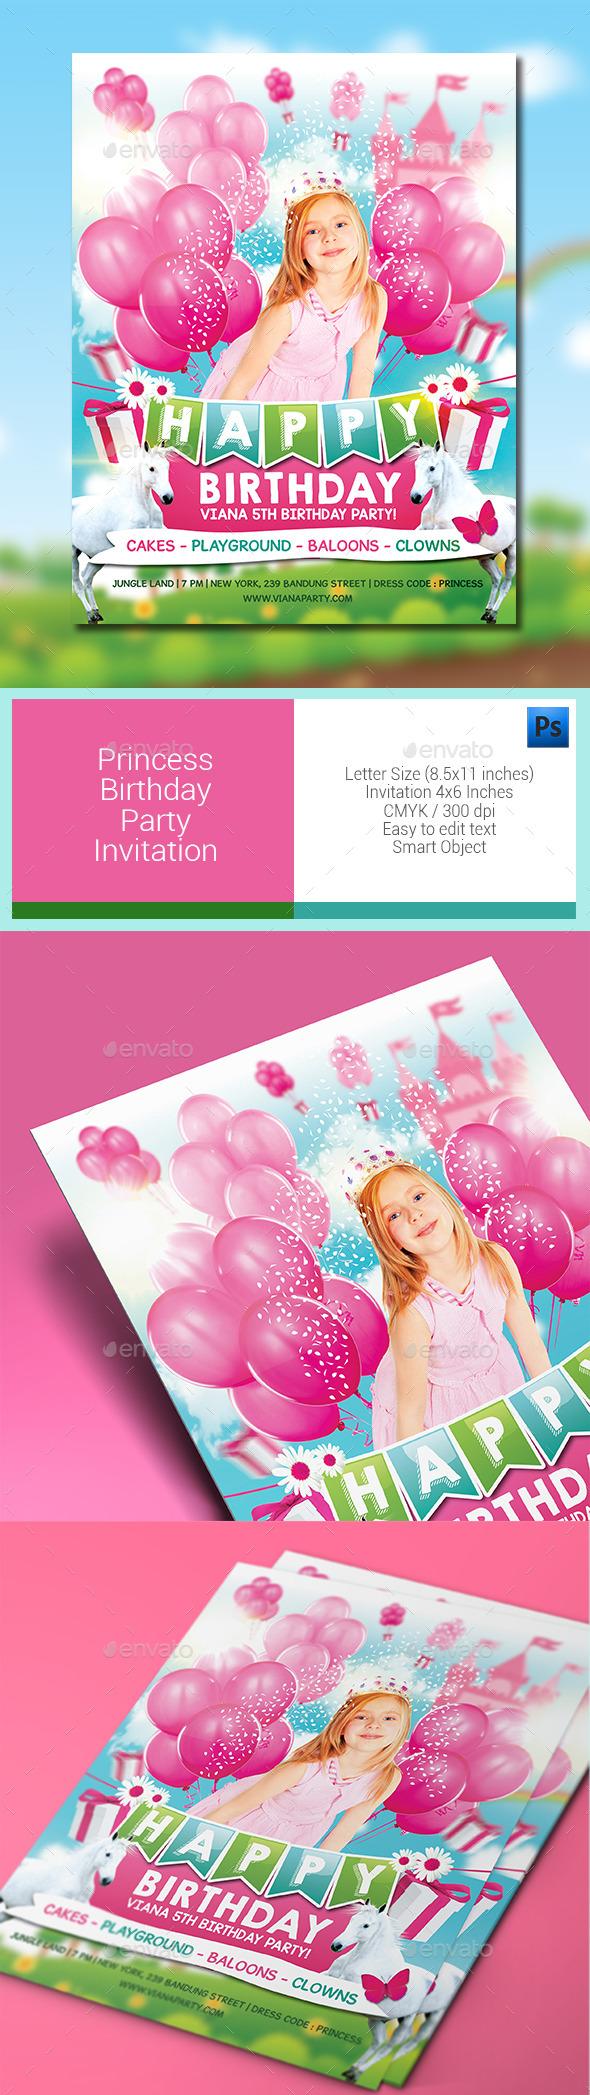 Princess Birthday Party Invitation - Birthday Greeting Cards